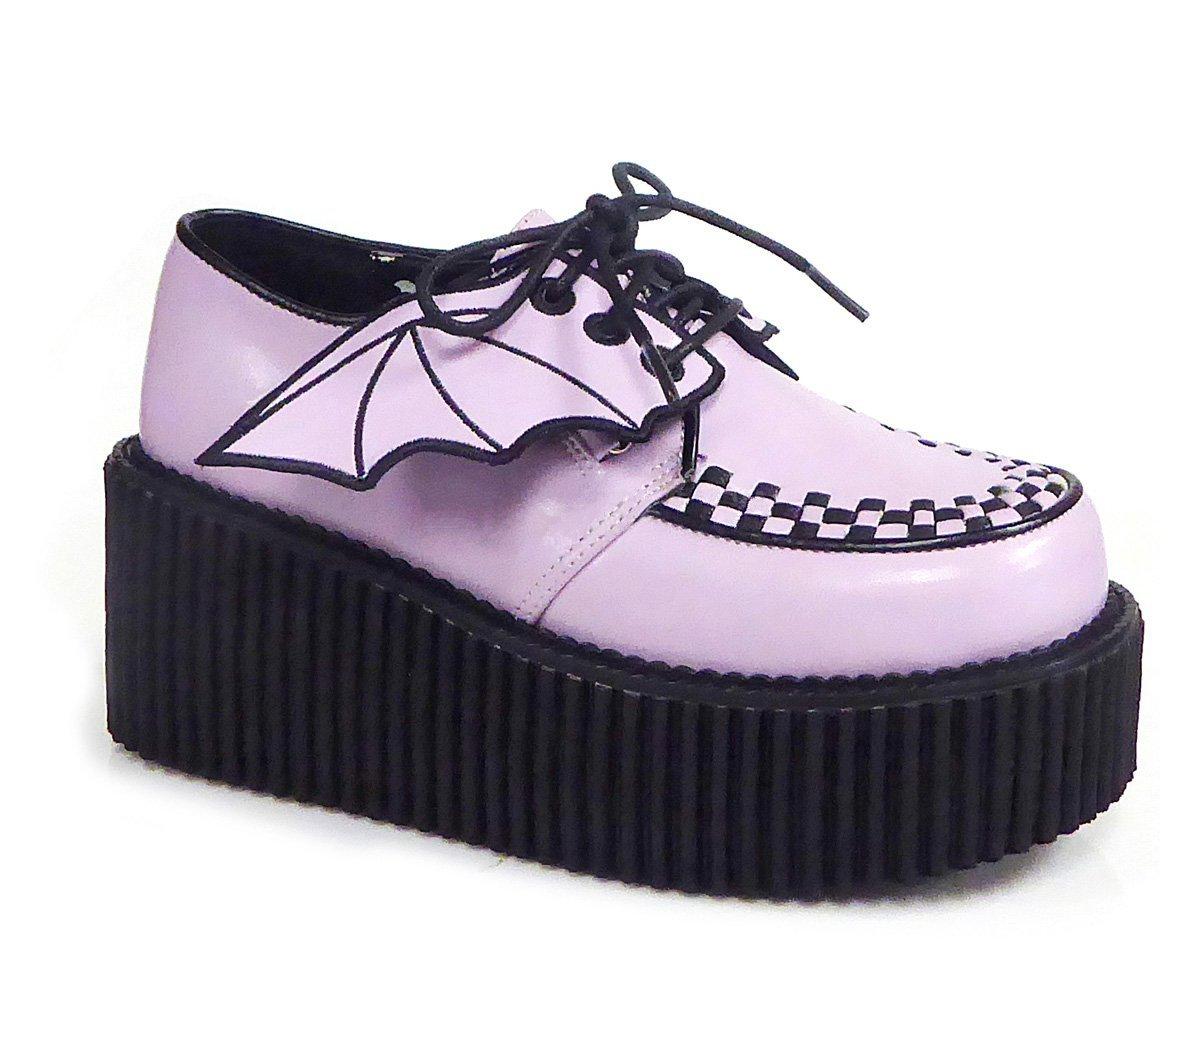 Demonia CREEPER-205 Womens Boots B074P9FQCQ 7 B(M) US|Lavender Vegan Leather